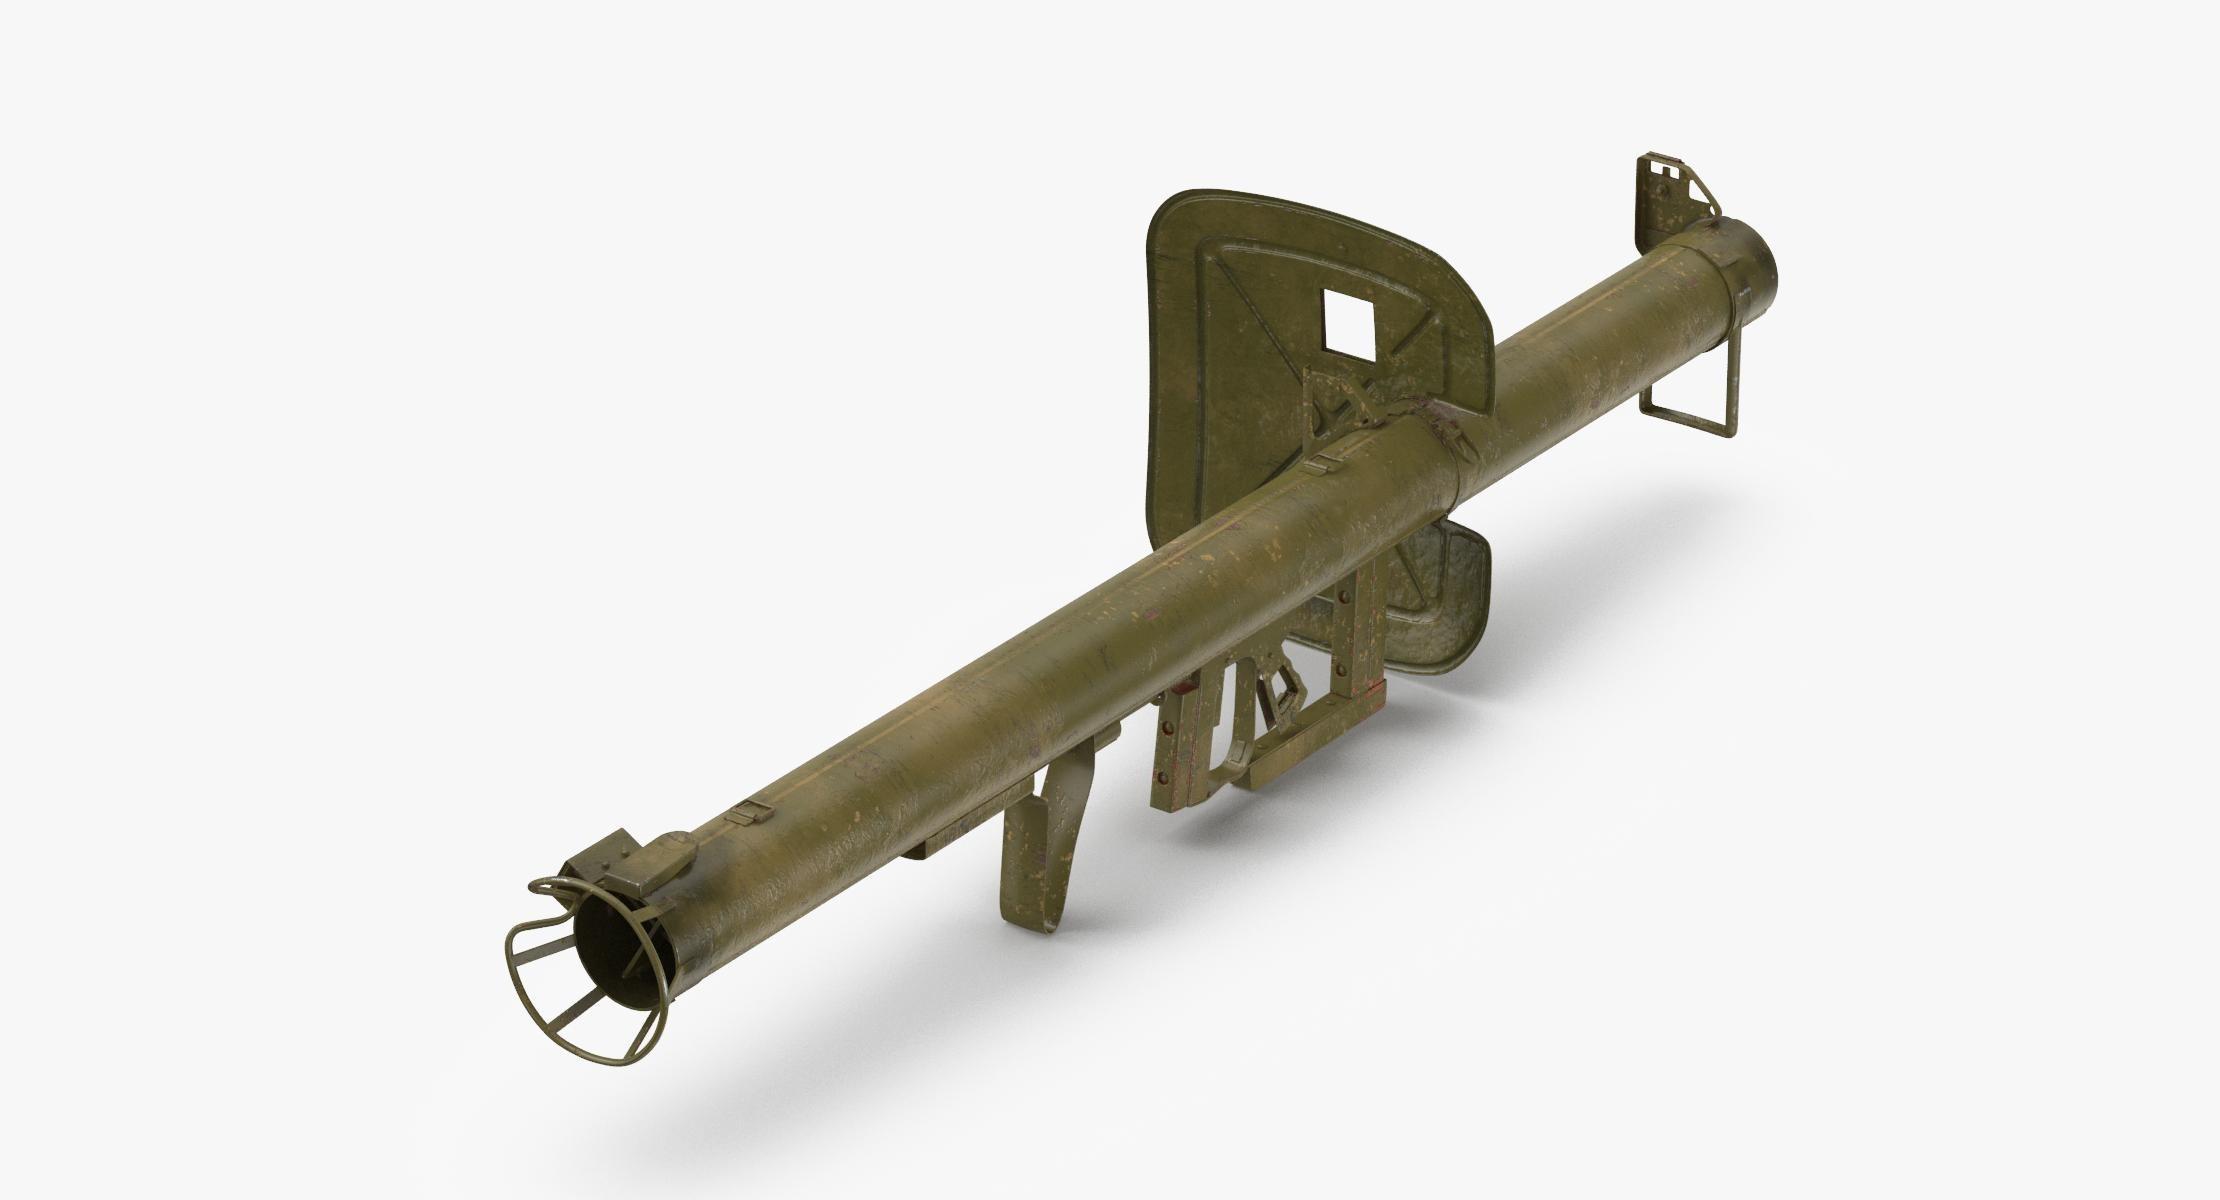 Panzerschreck - WWII - reel 1